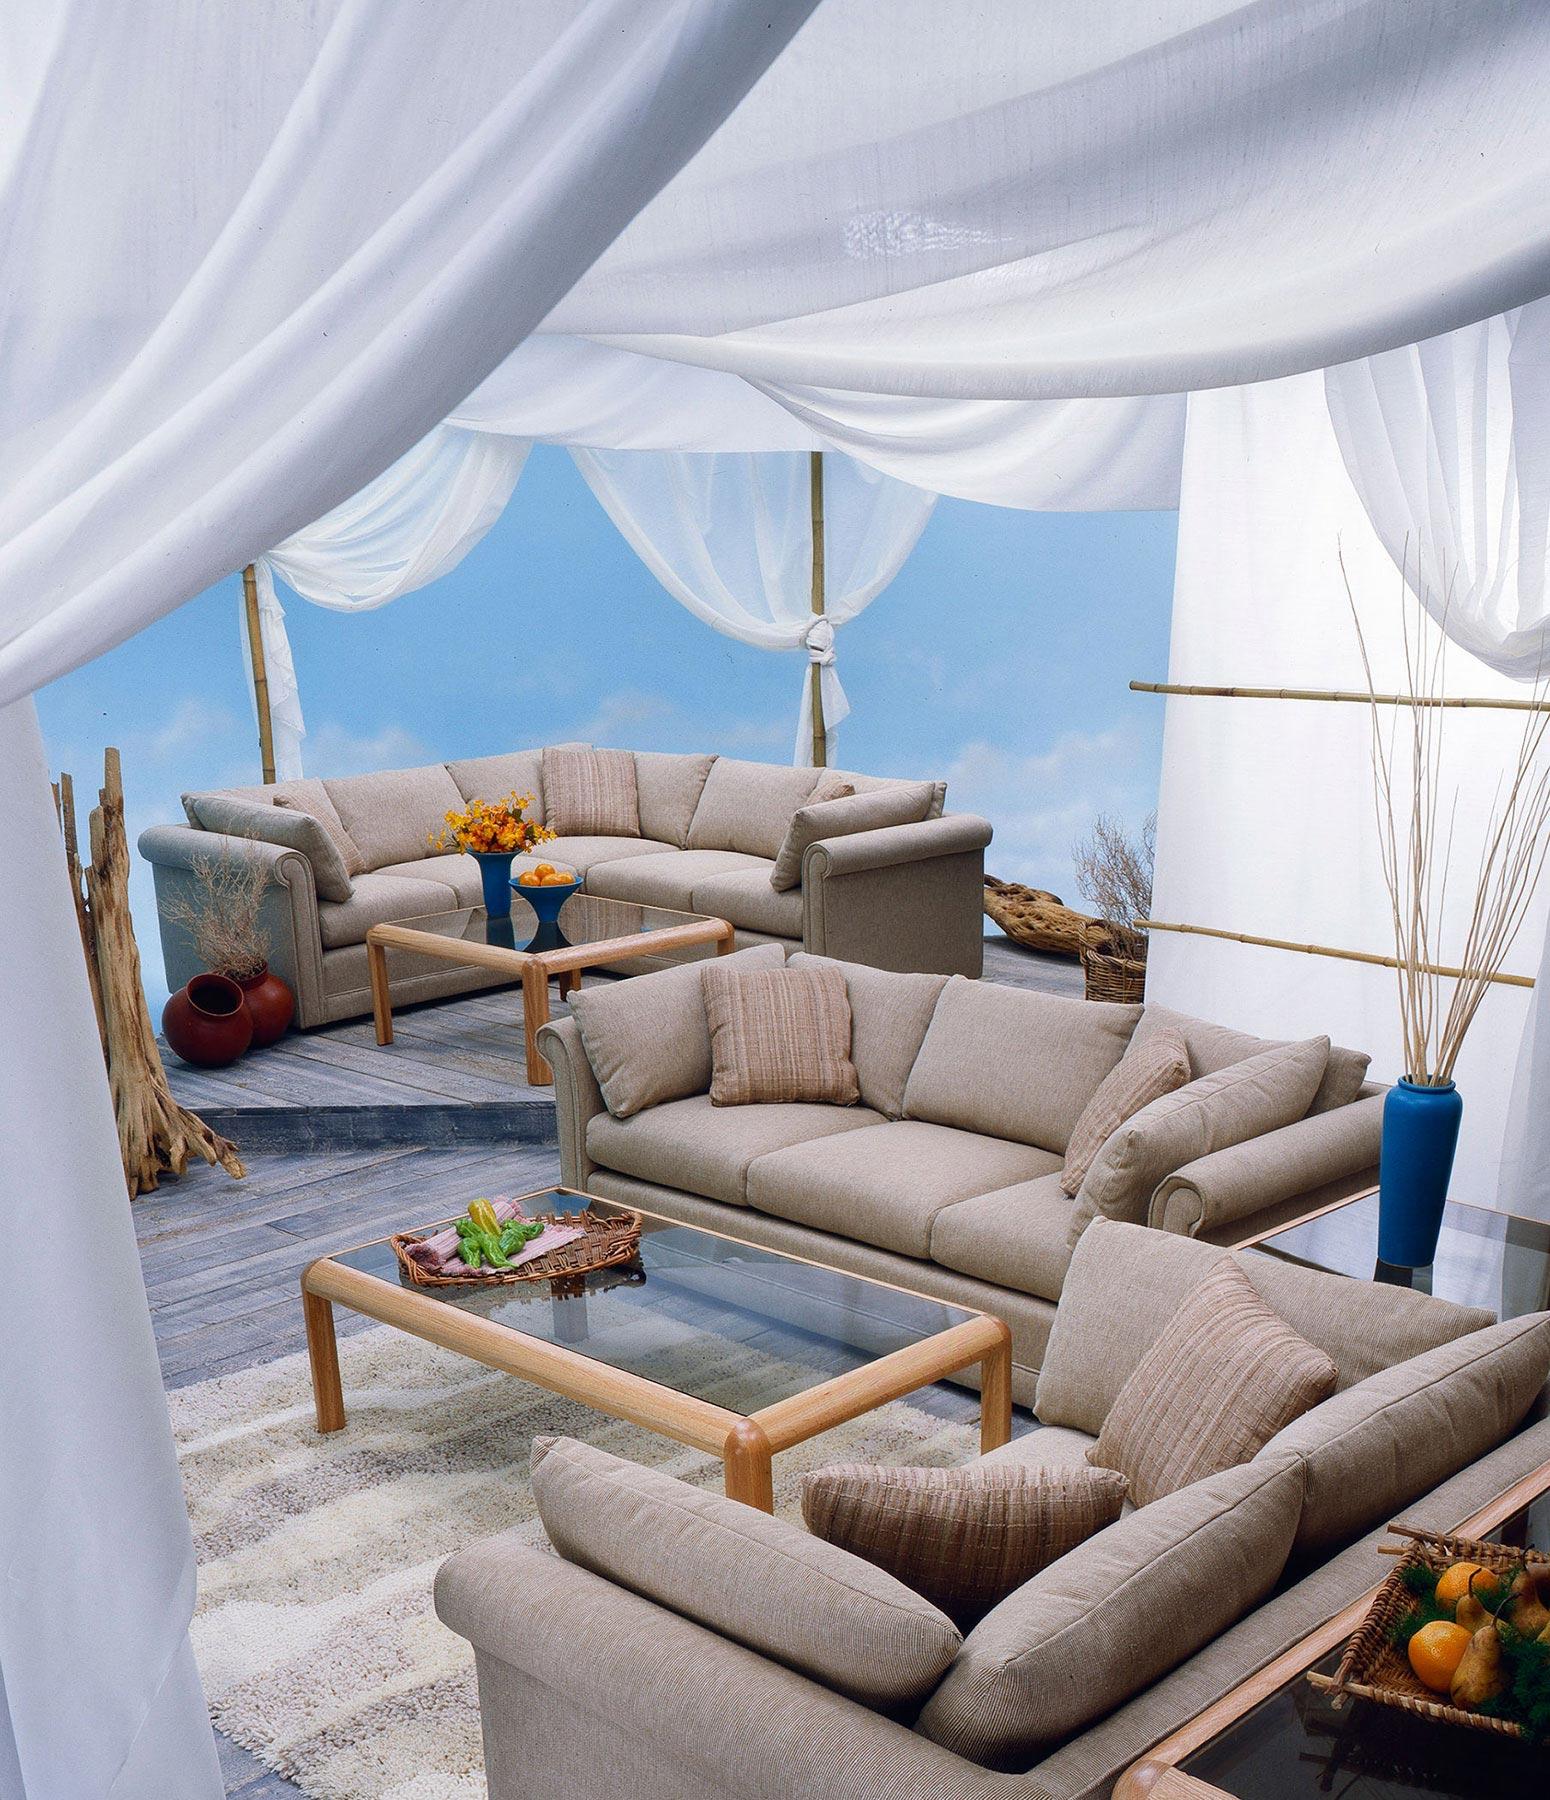 scaninavian-furniture-set17.jpg